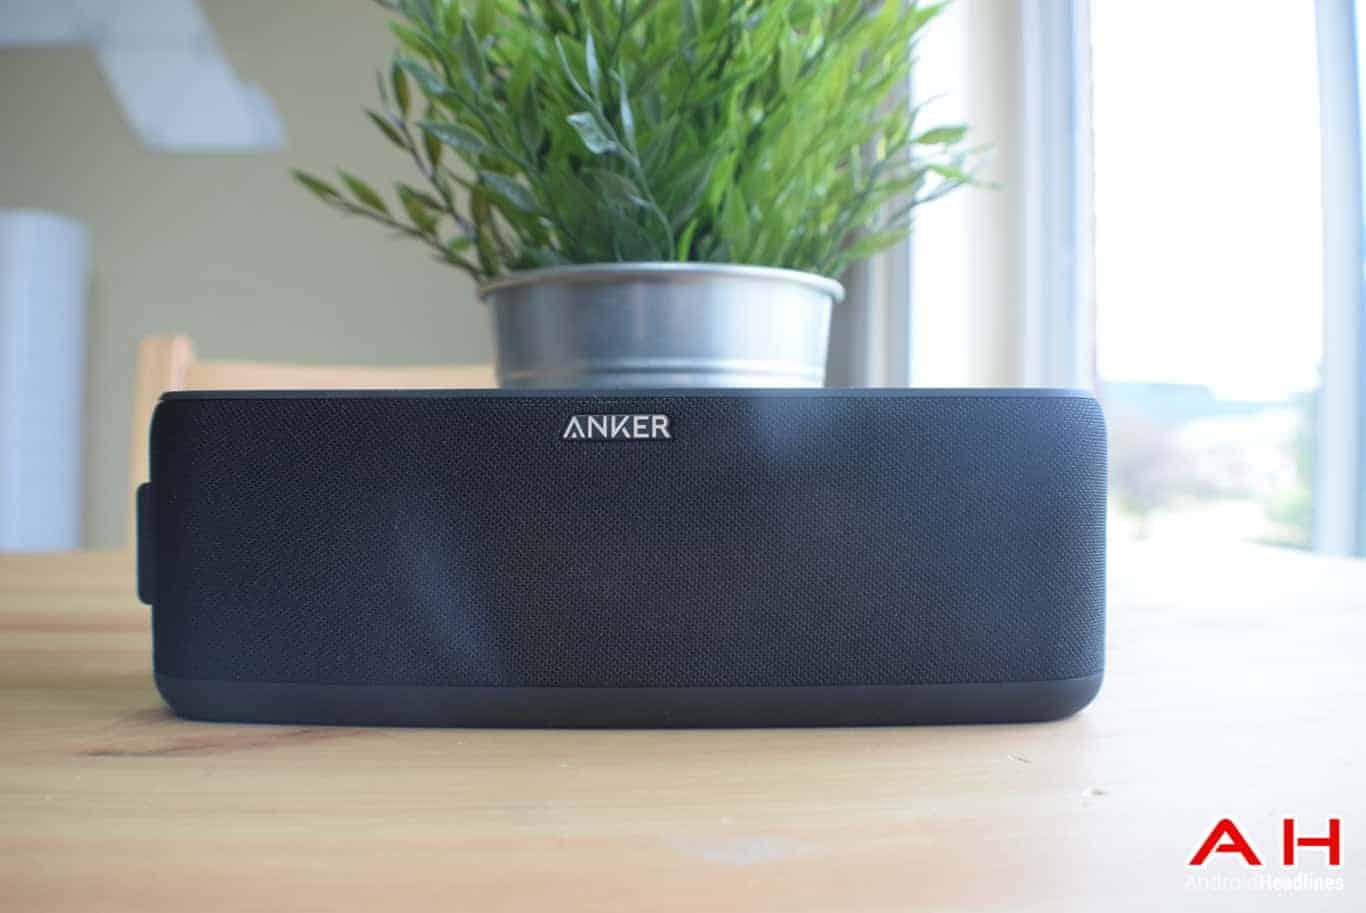 Anker SoundCore Boost AM AH 4